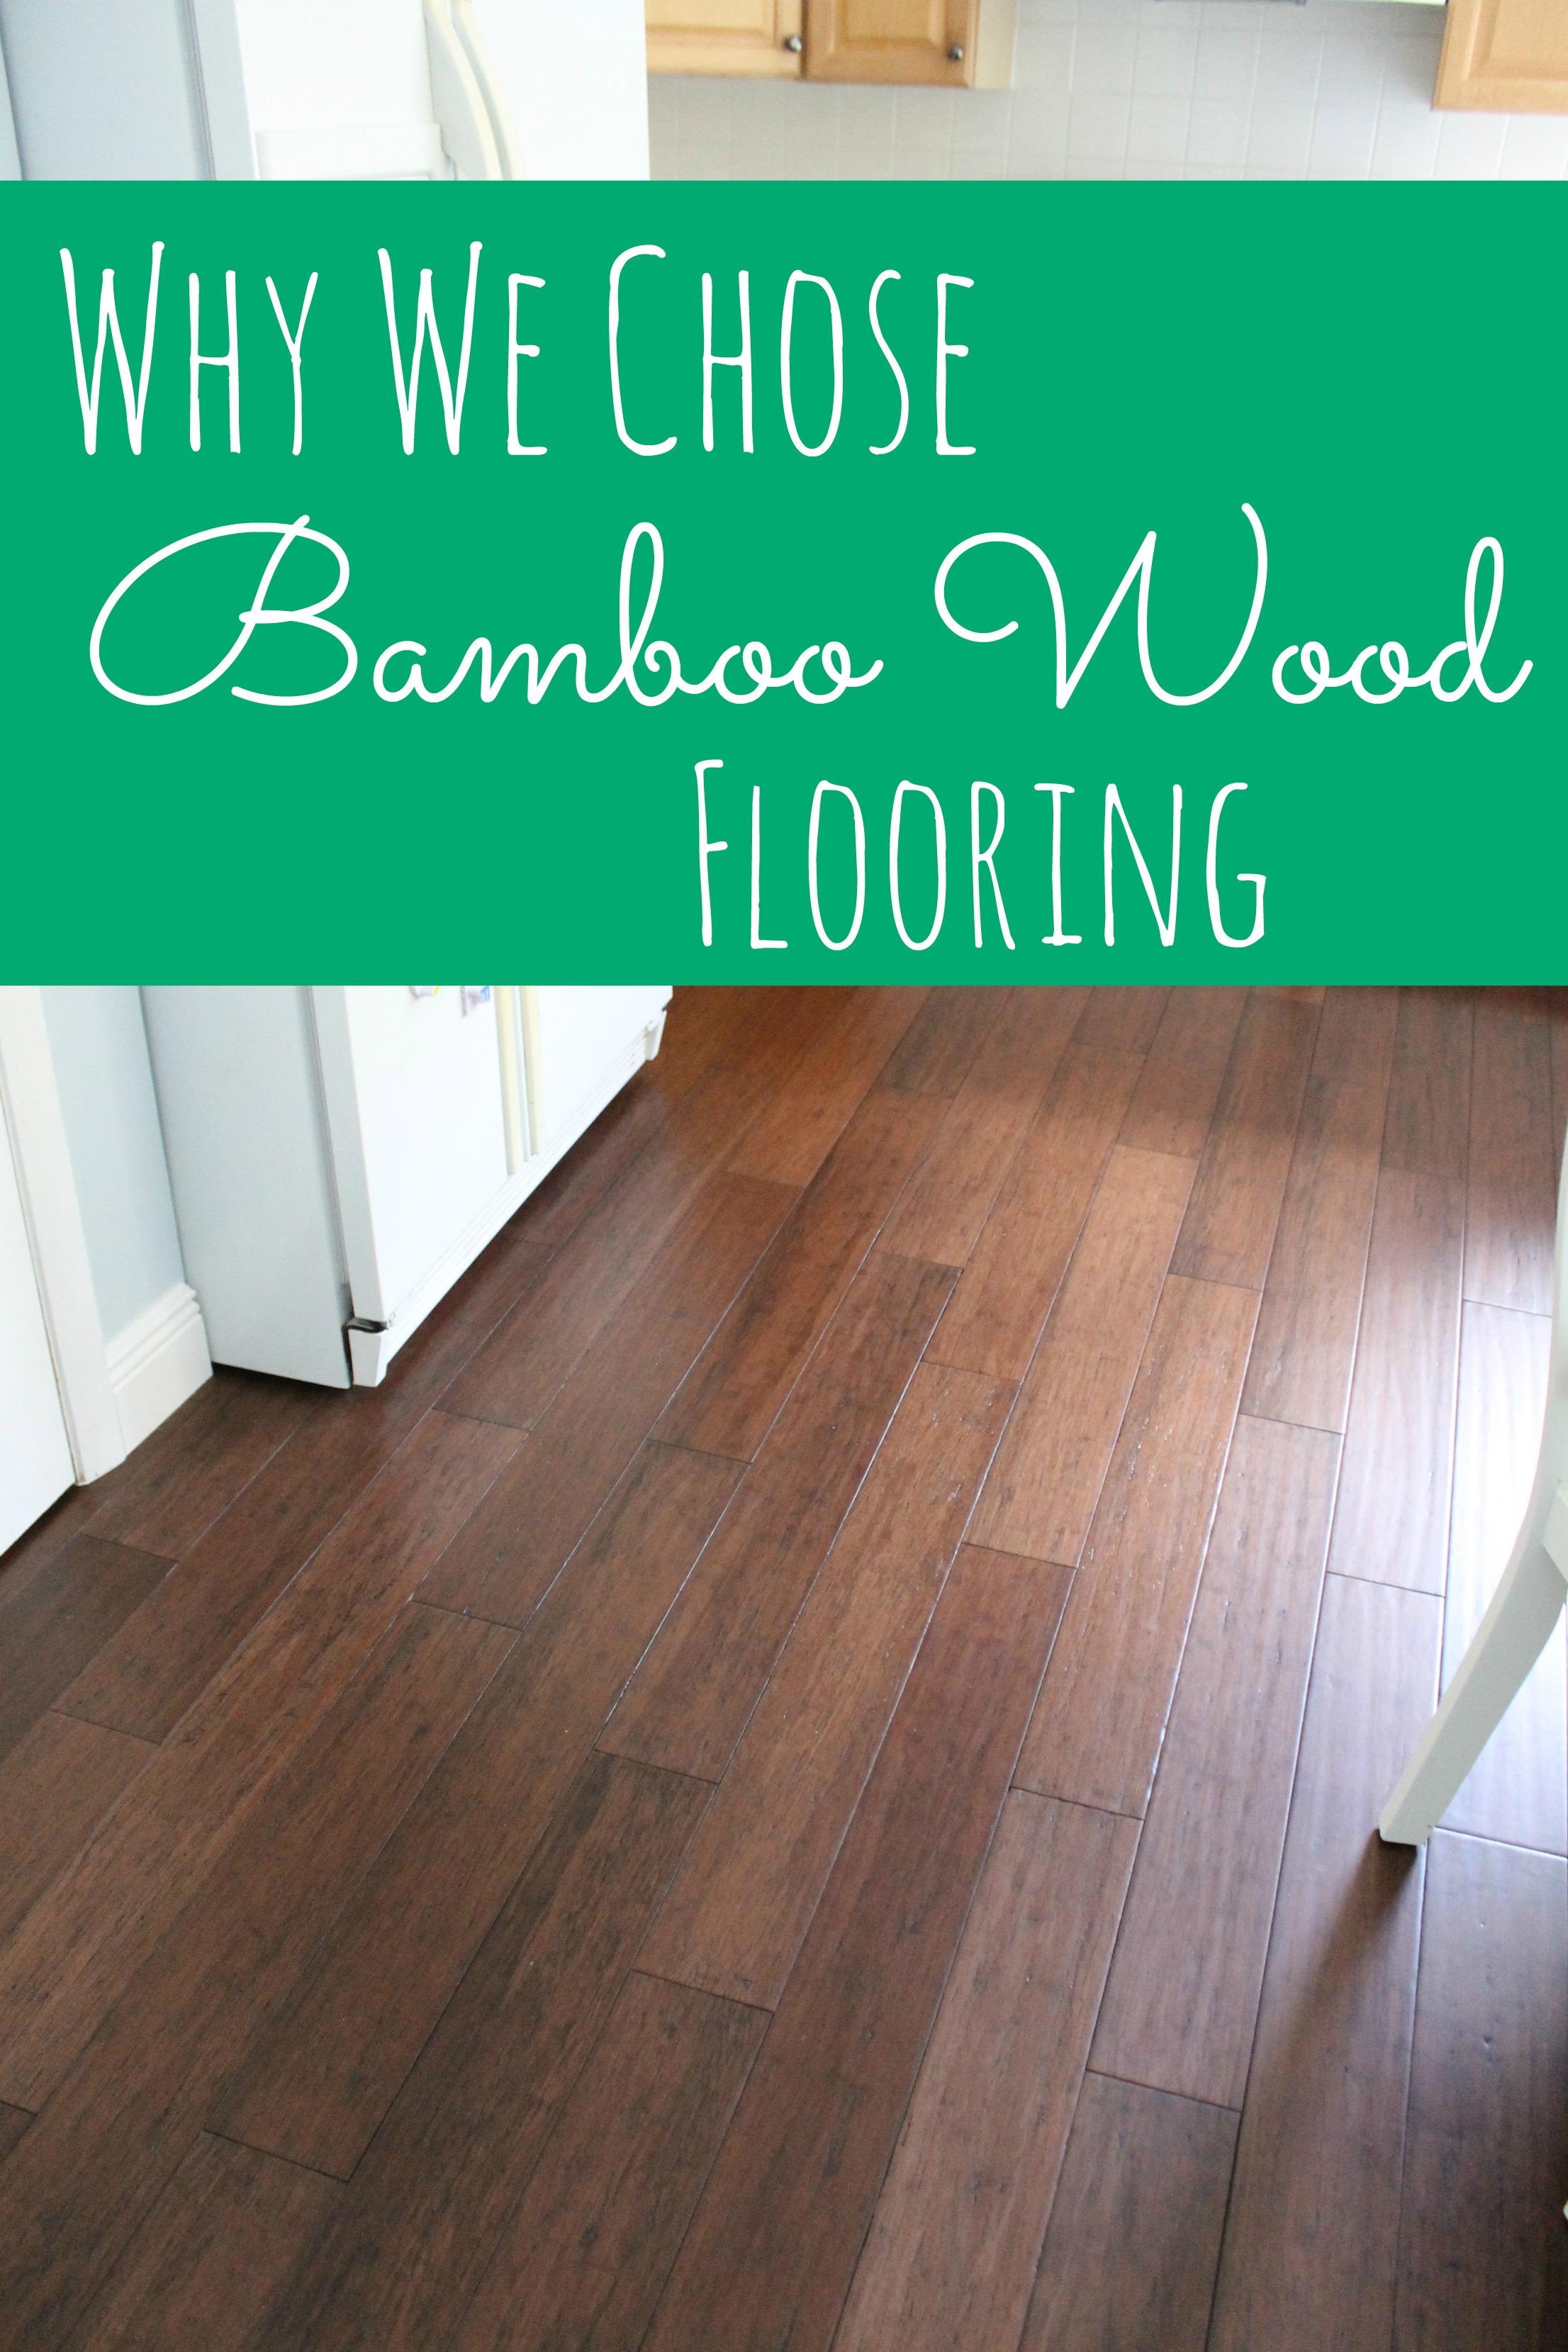 Strand Woven Bamboo Flooring Vs HardwoodThe Average Cost Of Bamboo - Bamboo floor scratches easily